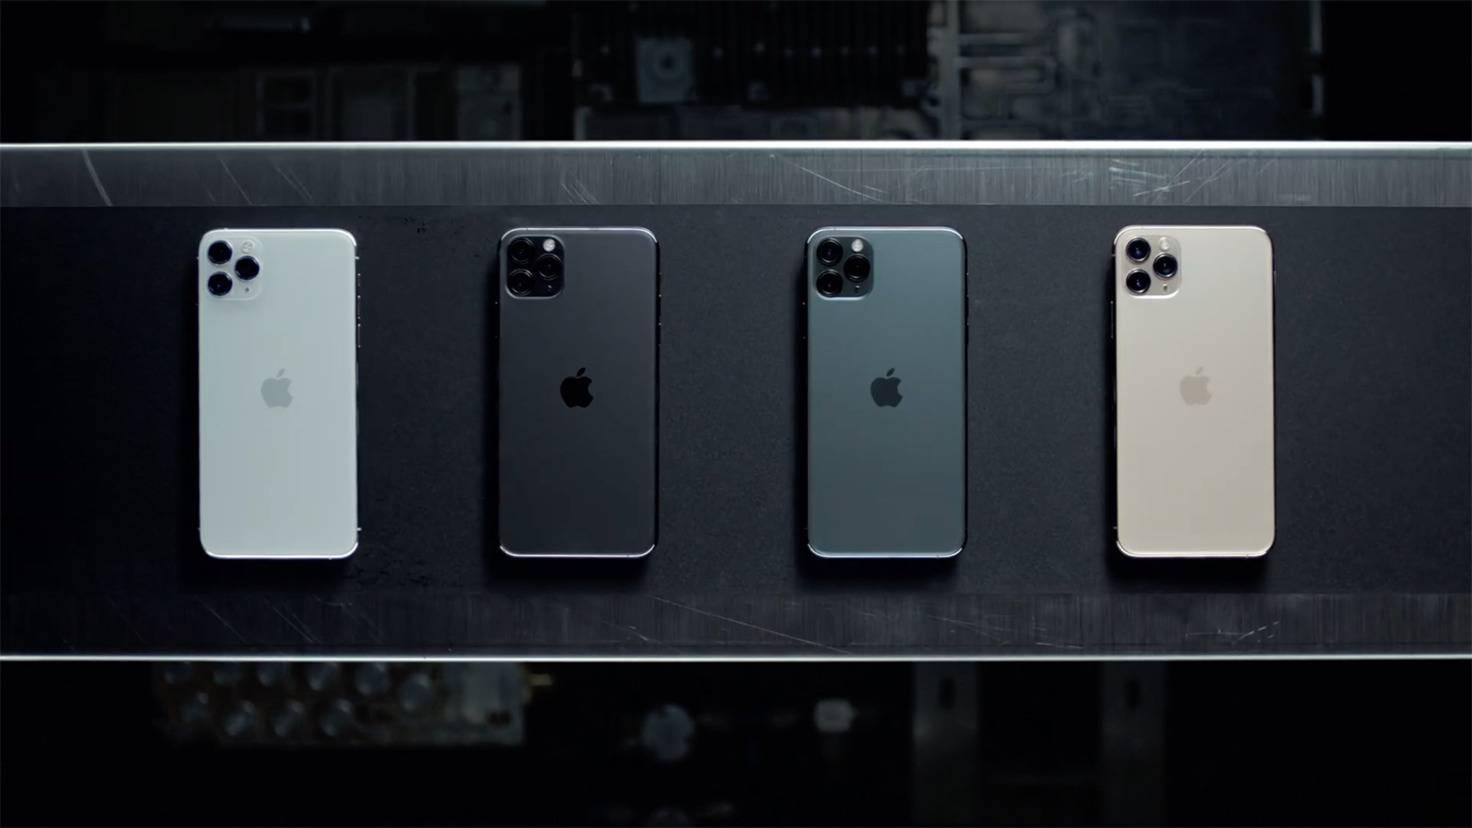 iphone 11 pro apple watch 5 co die highlights der. Black Bedroom Furniture Sets. Home Design Ideas